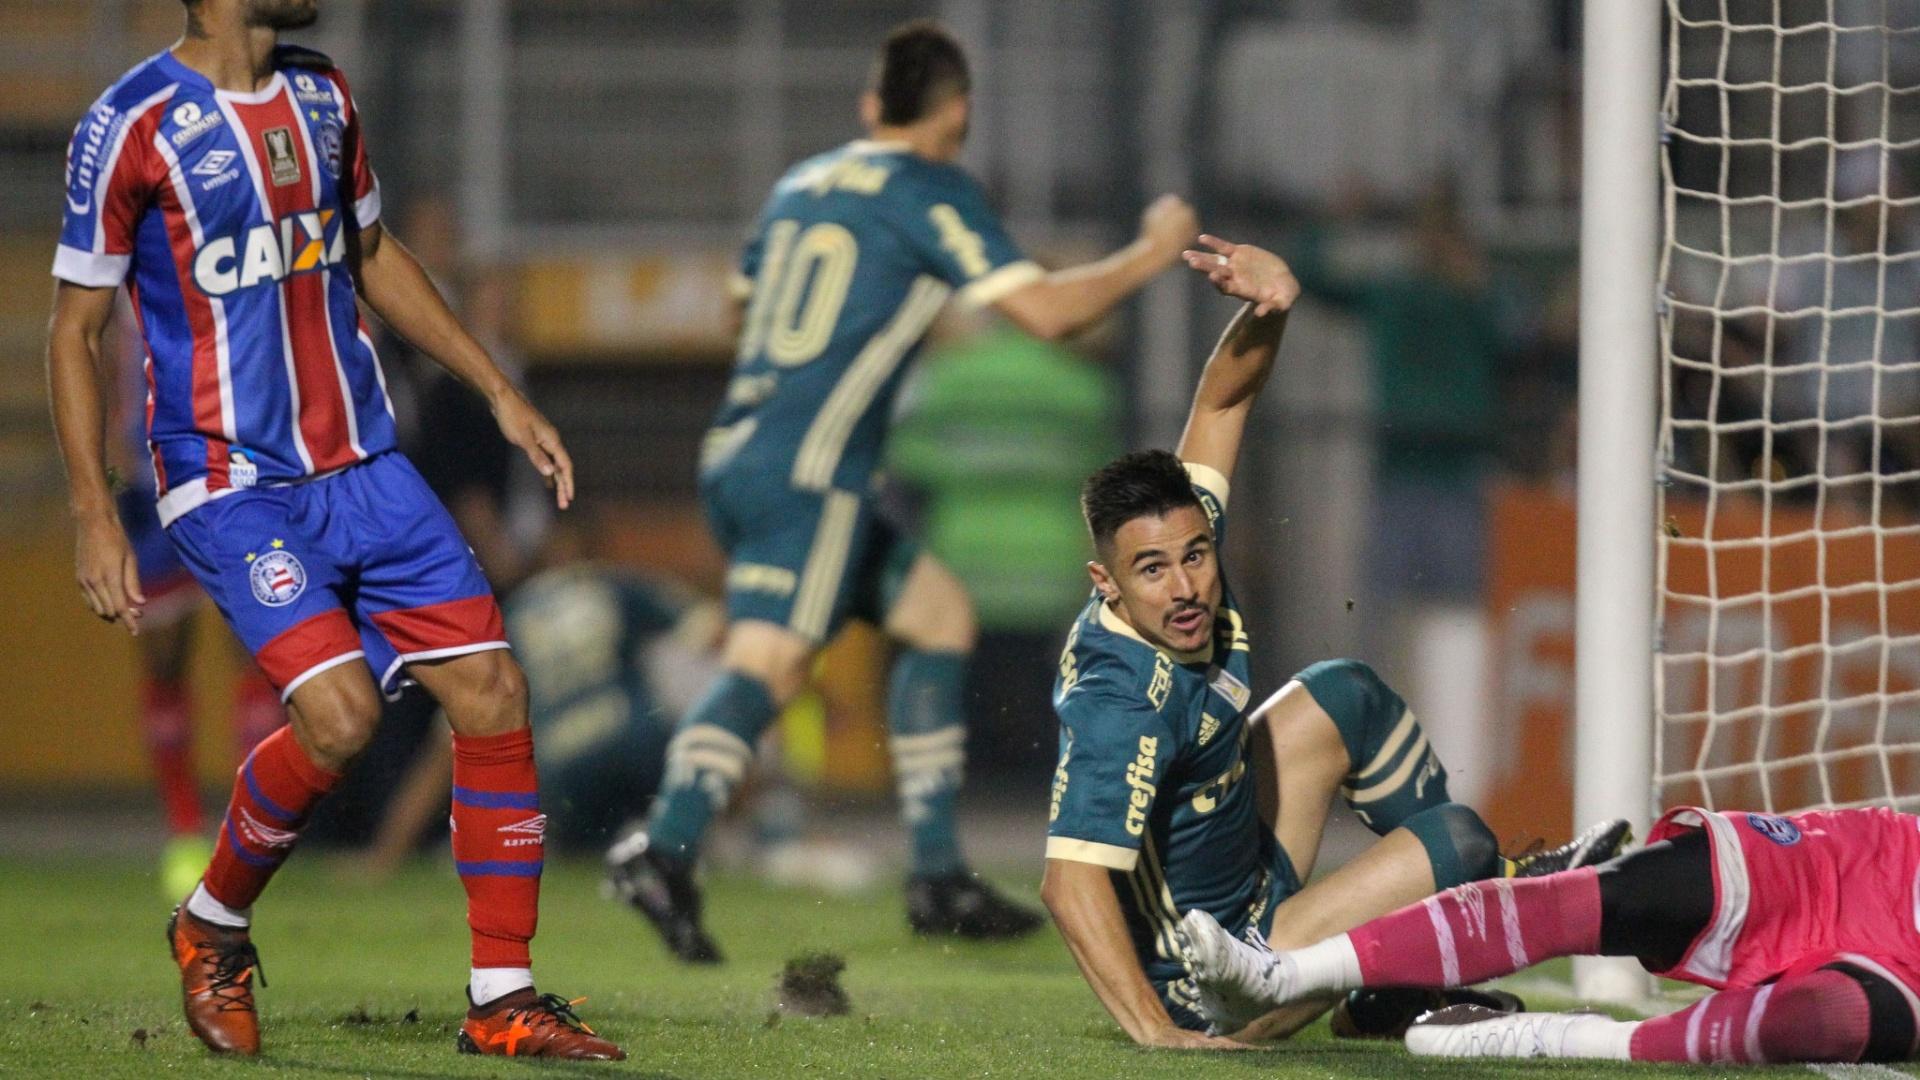 Willian comemora gol que abriu o placar para o Palmeiras contra o Bahia